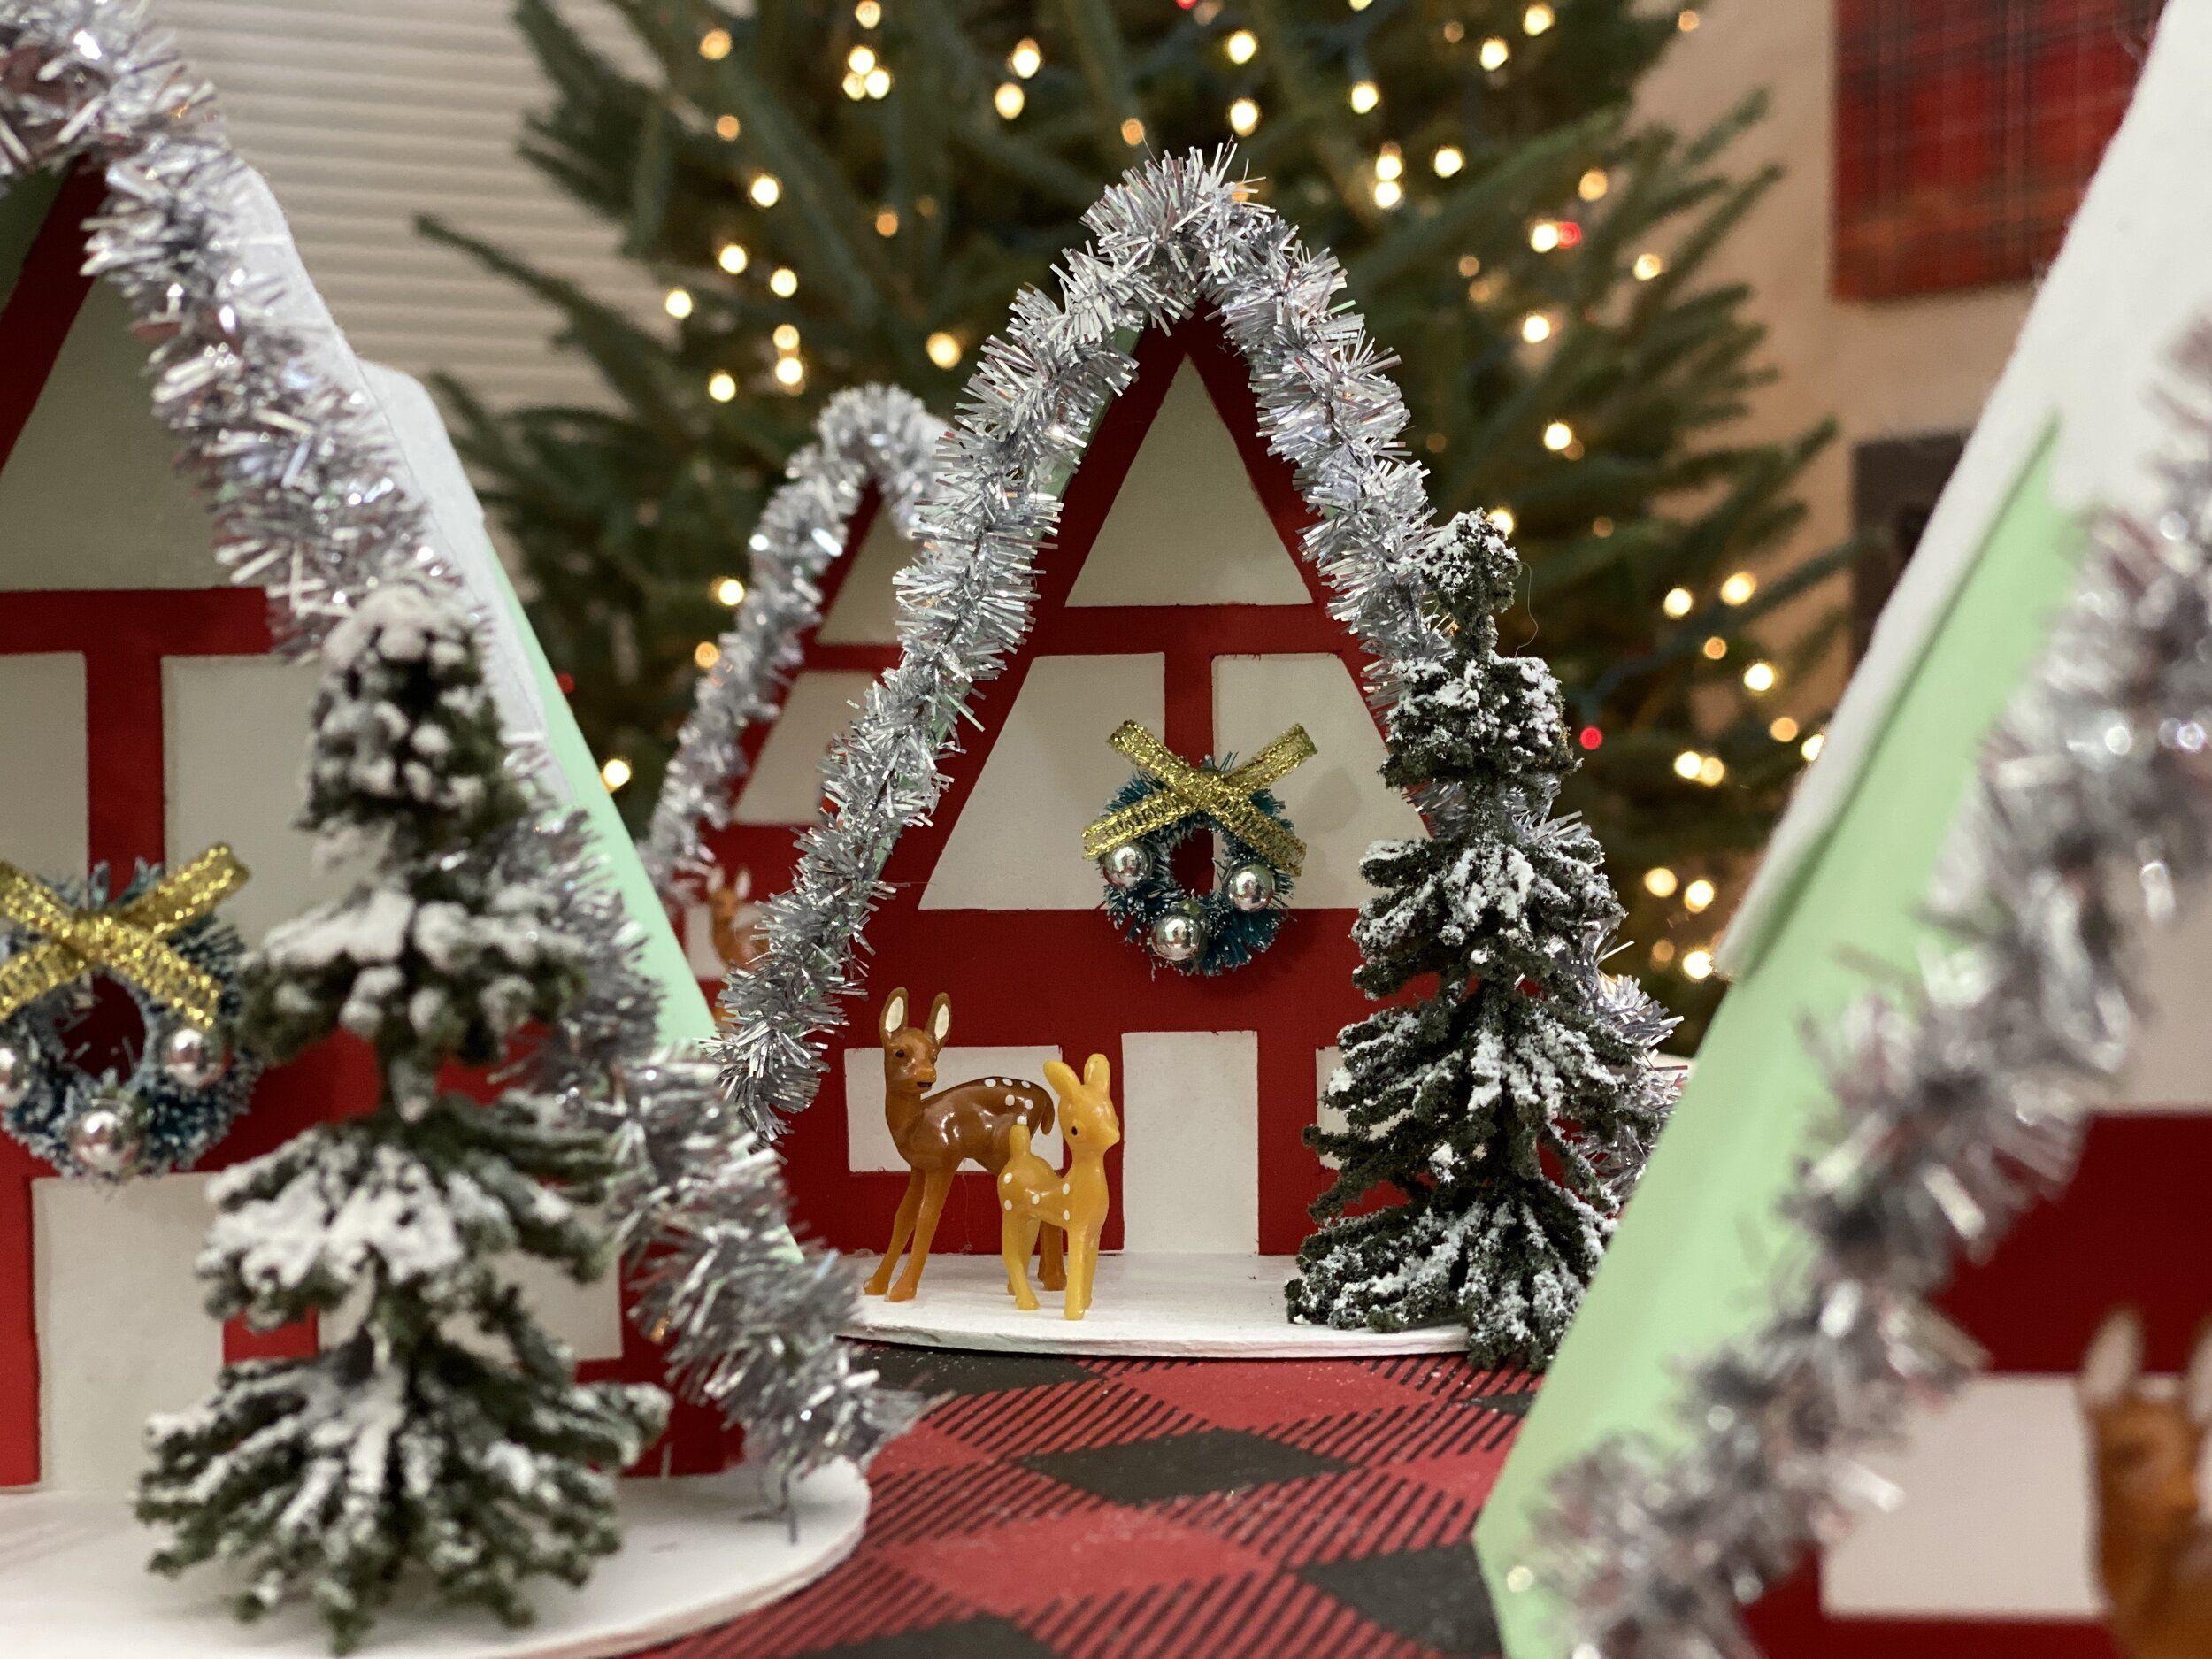 Diy Cricut Maker Wooden A Frame Ornaments Diy Candy Cane Lane Christmas Tree Make Mini Vintage Christmas Tree Christmas Tree Ornaments Silver Christmas Tree